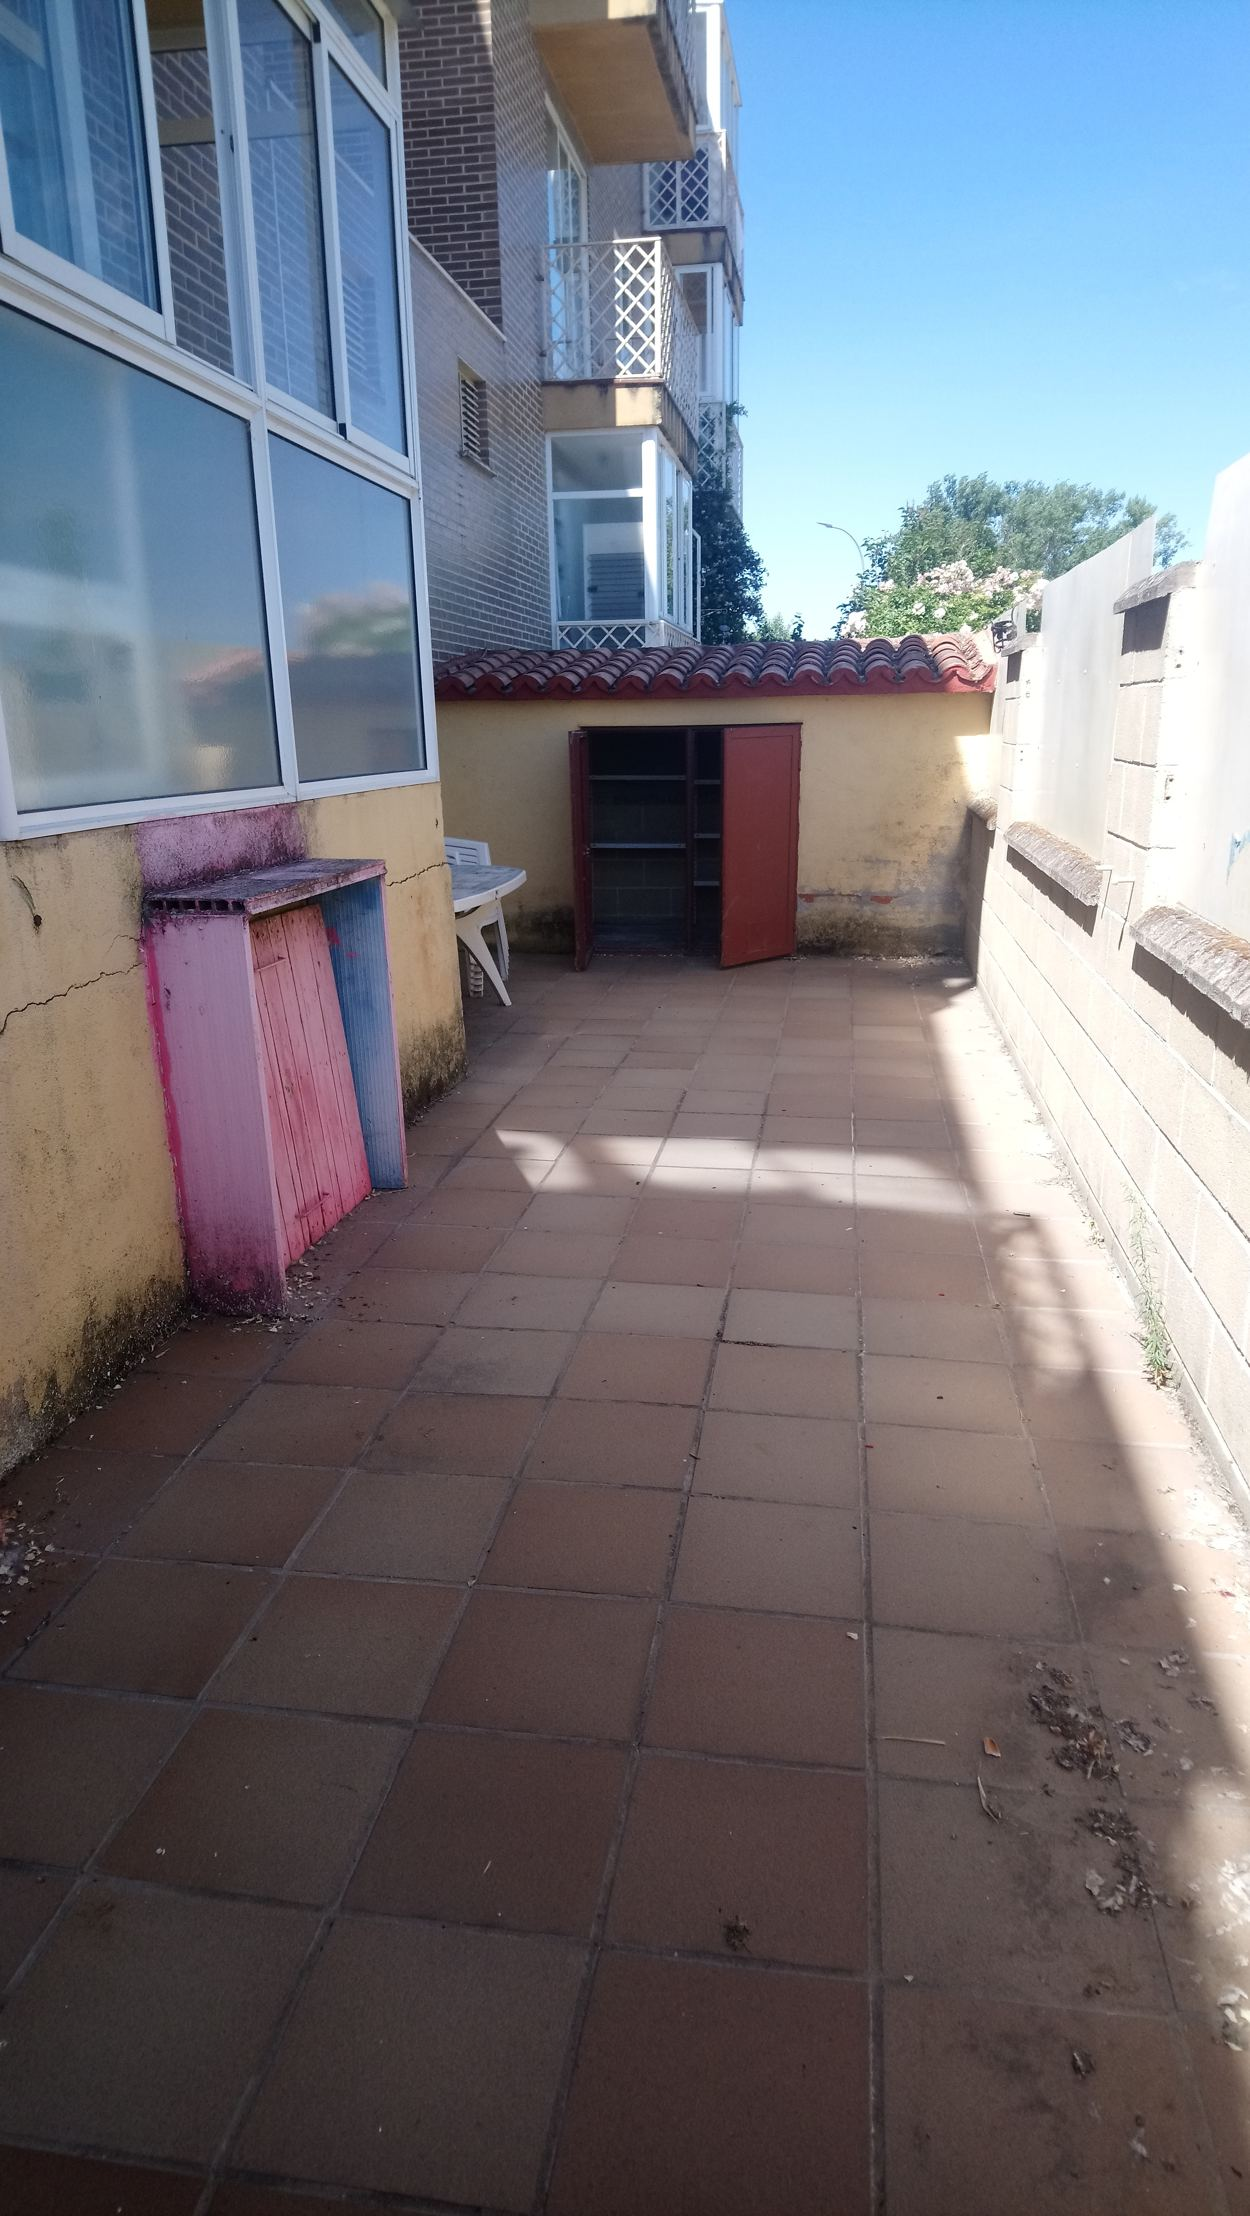 original vivienda en SANTA MARTA DE TORMES (REF: 61) - foto 4 20180720104220_DSC_1463.jpg